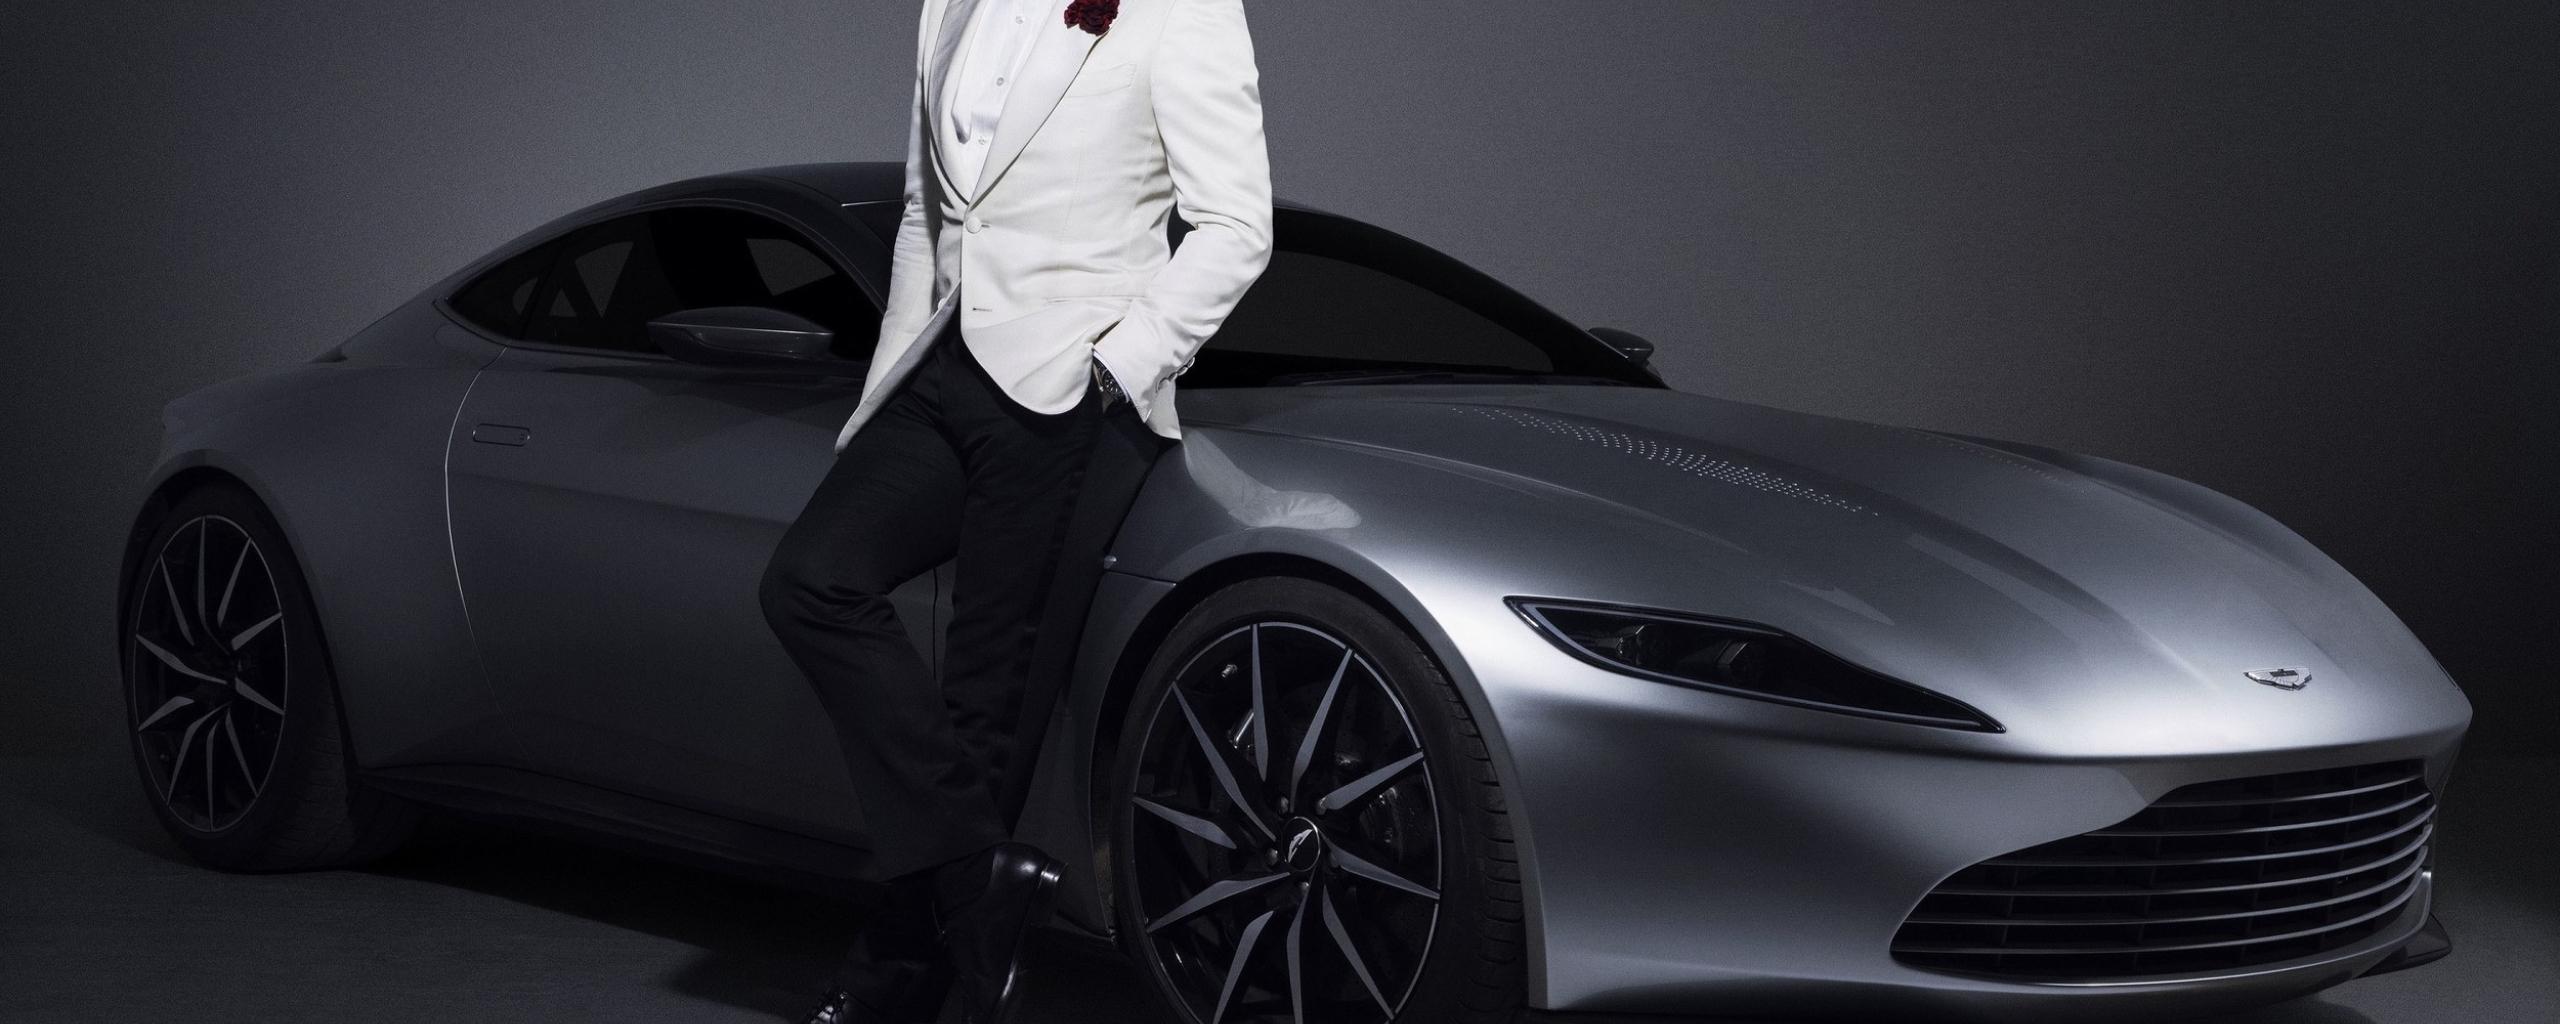 Daniel Craig 007 James Bond Aston Martin Car Photoshoot ...